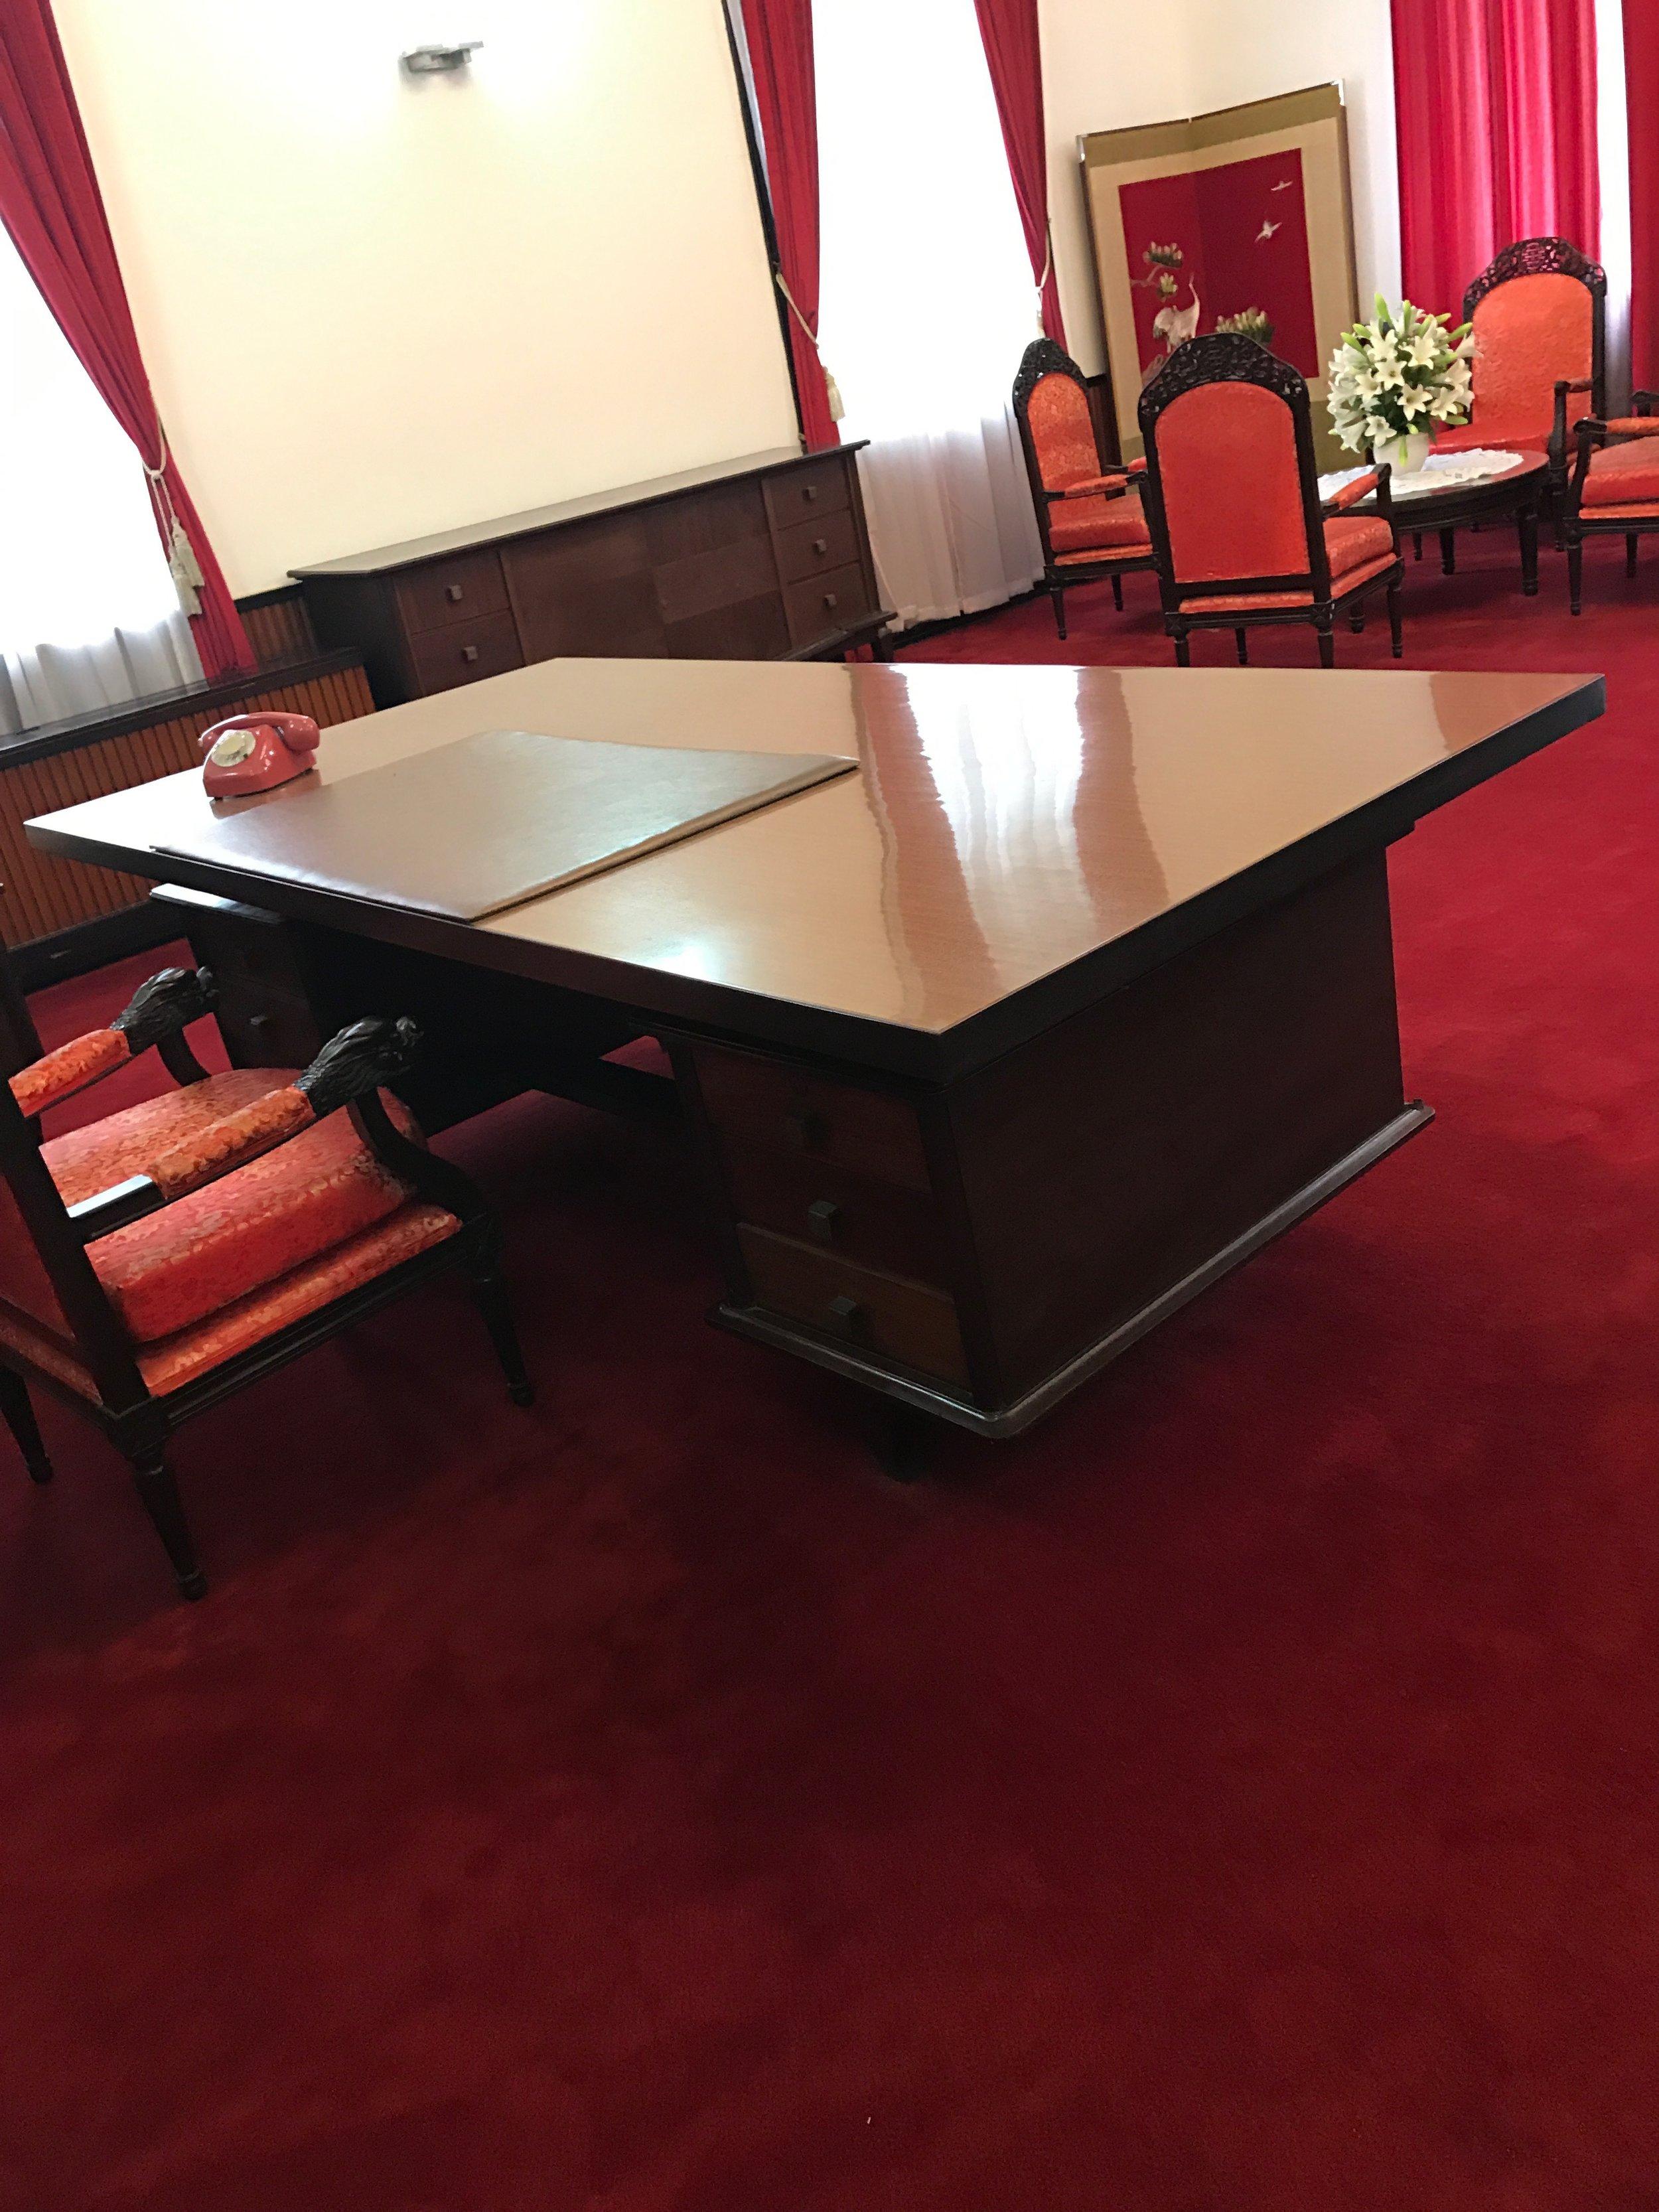 Desk of the President of South Vietnam